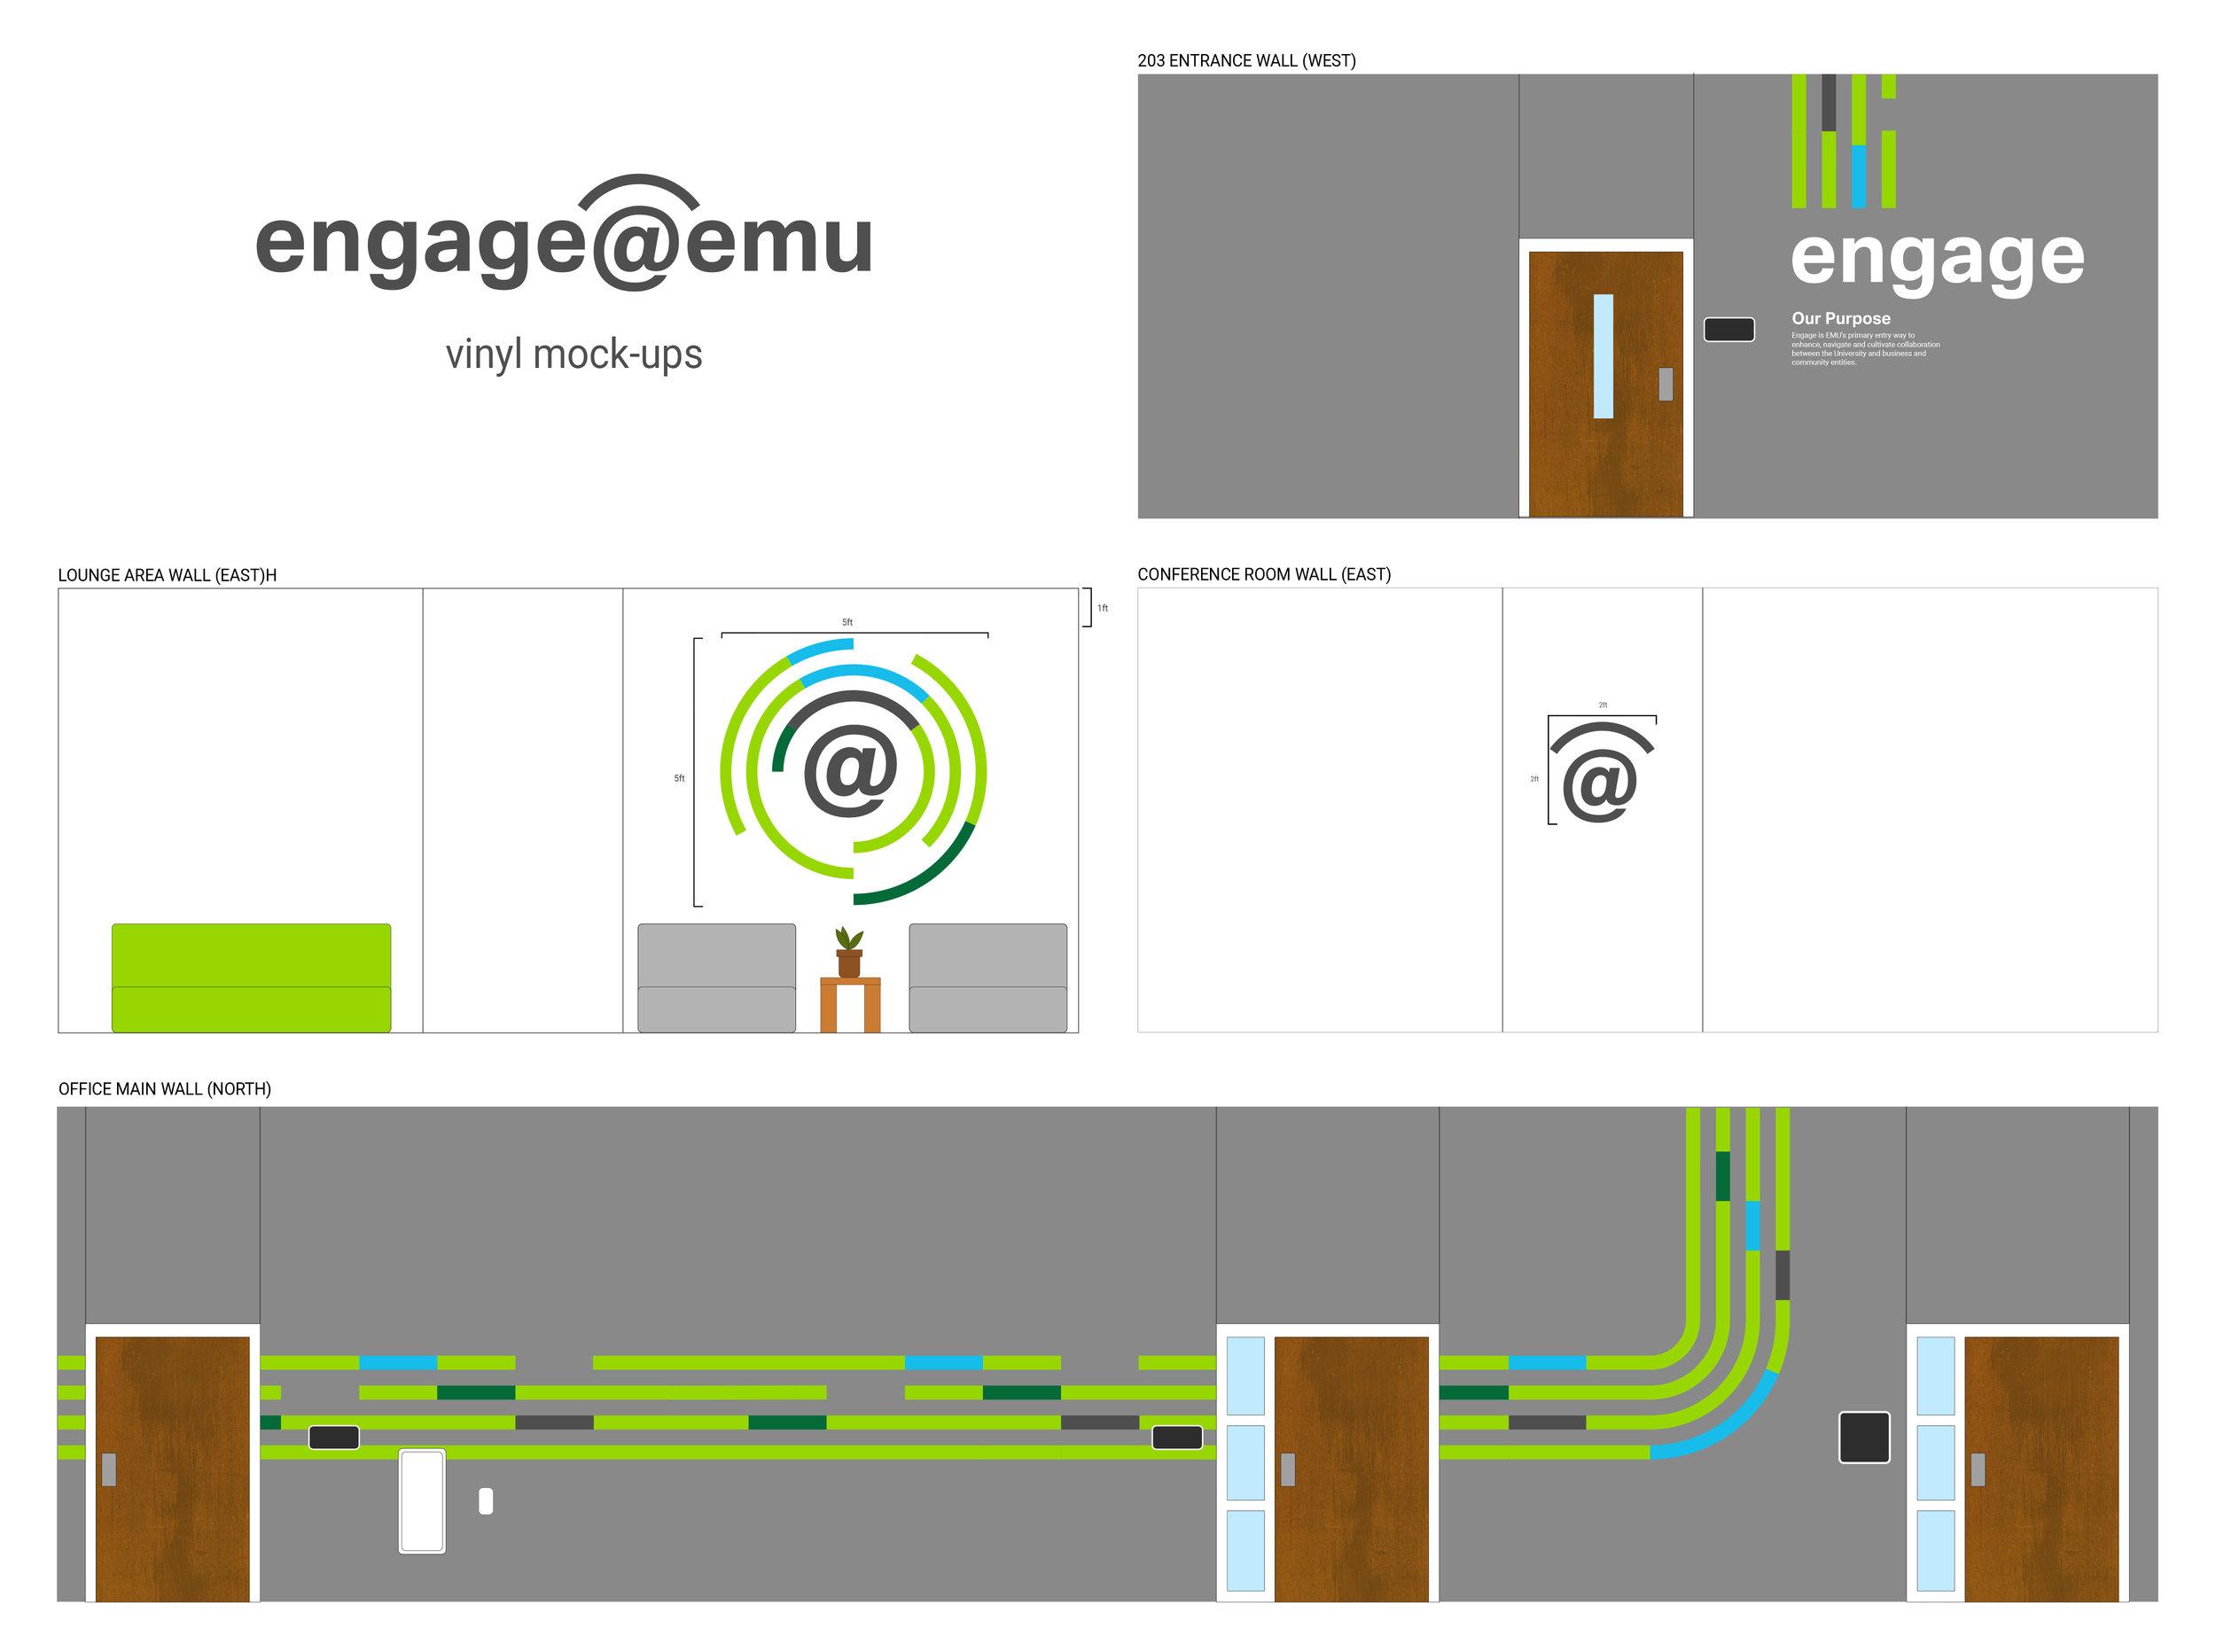 engage_vinyls (1).jpg